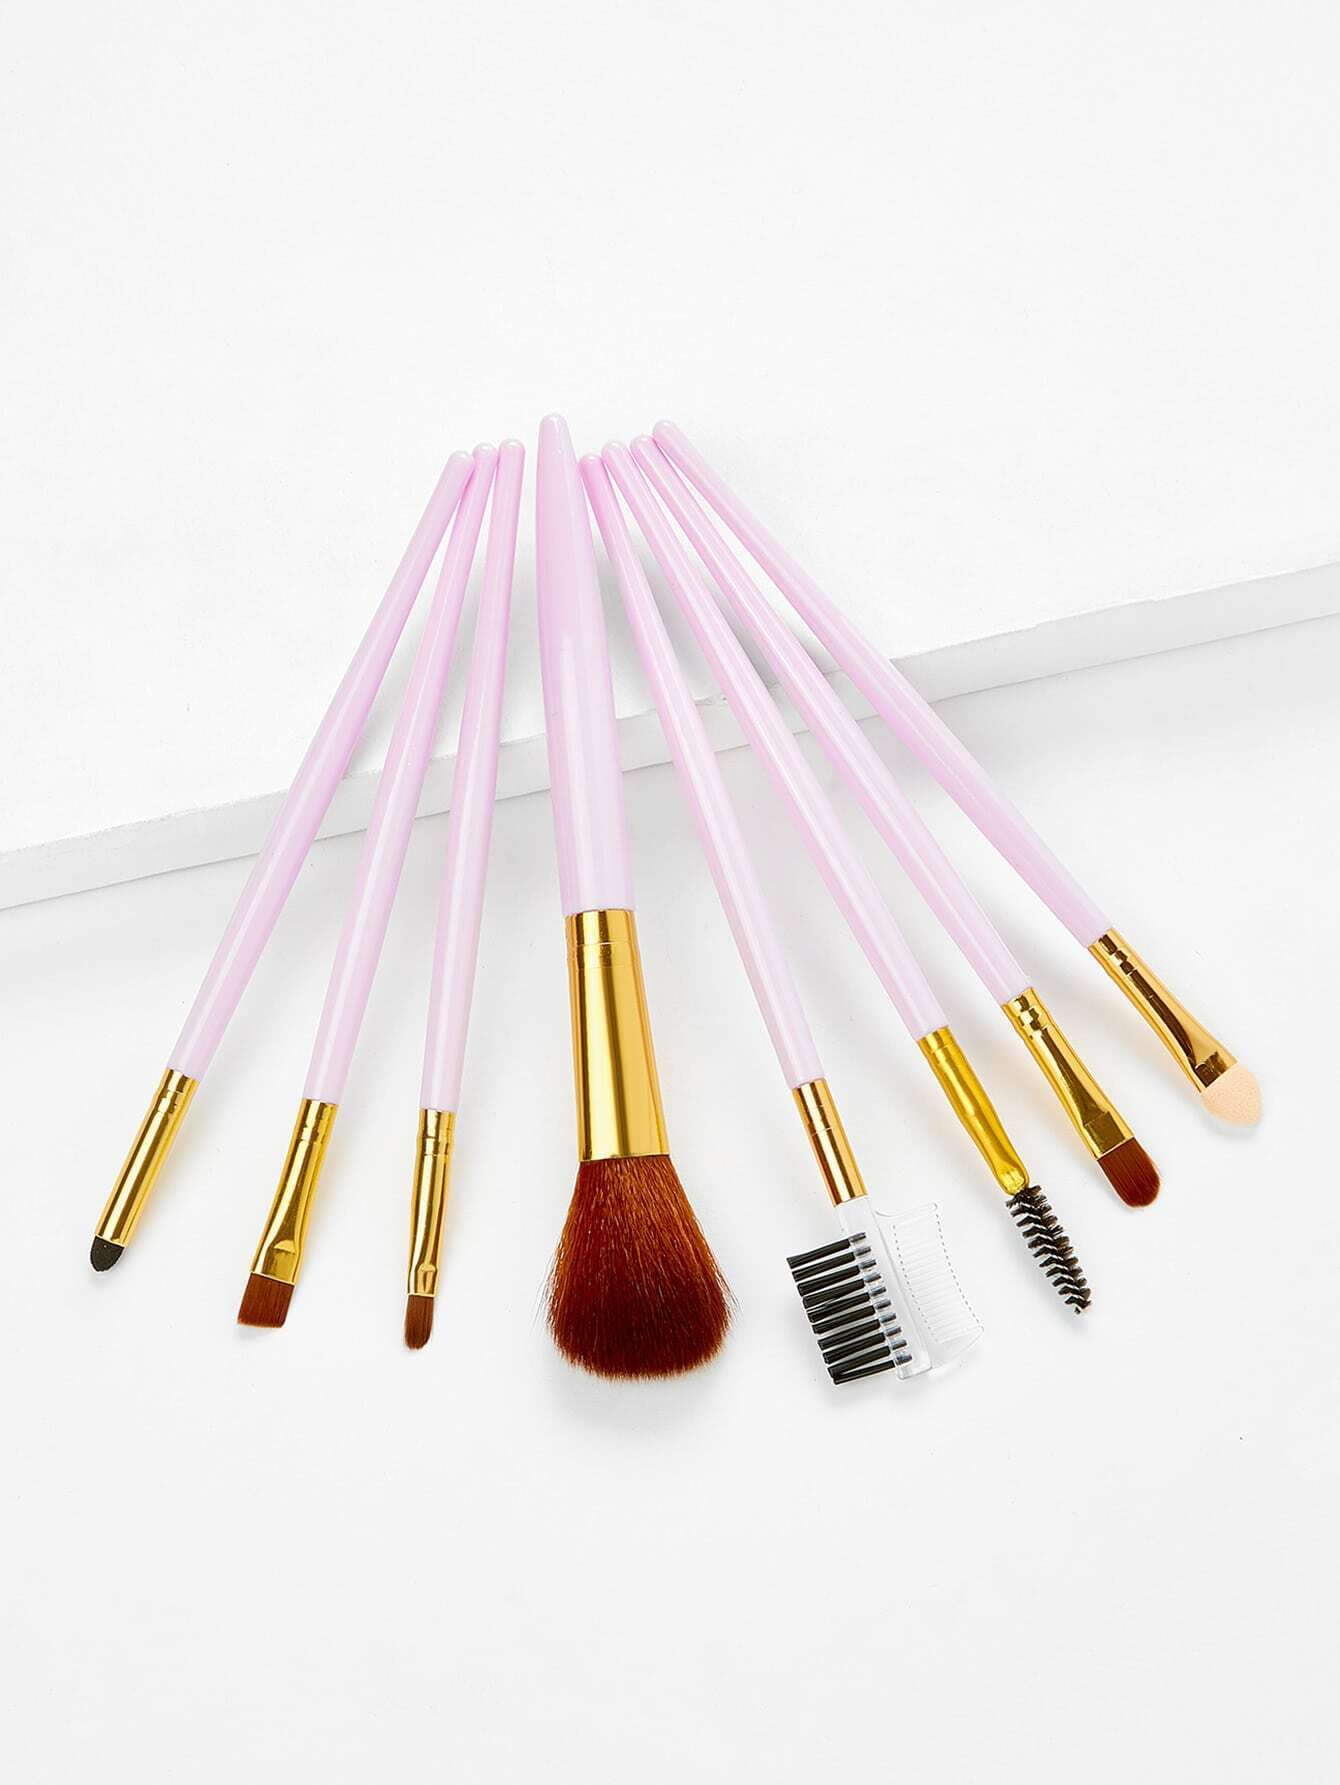 Two Tone Handle Makeup Brush Set 8Pcs two tone handle makeup brush 7pcs